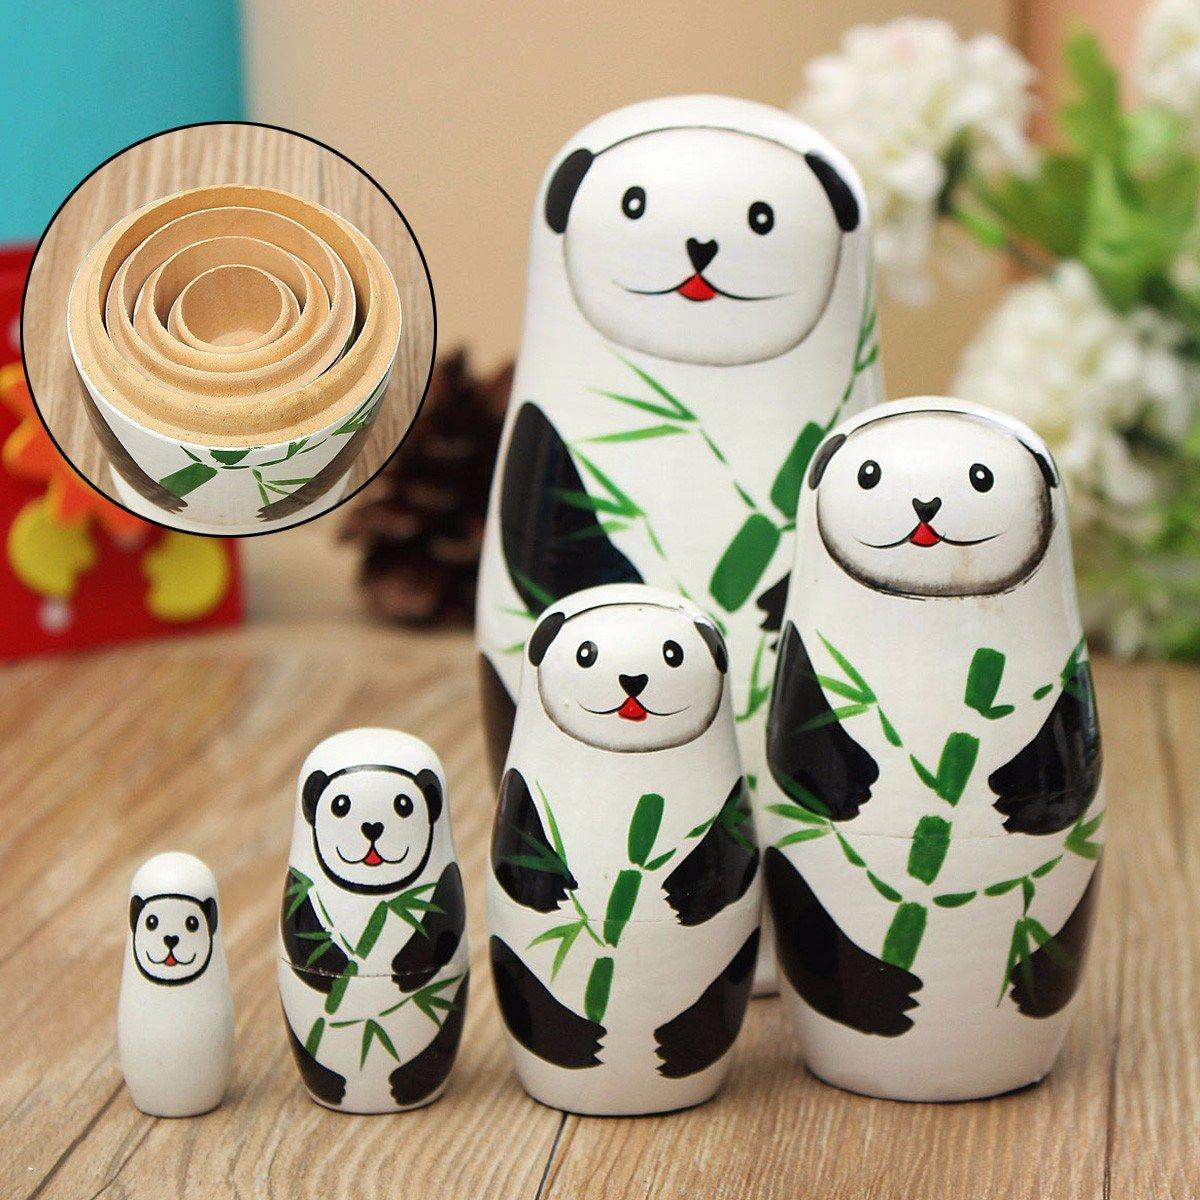 5 Pcs Panda Russian Wood Nesting Doll Matryoshka Stacking Dolls Tricky Toys Creative Gift